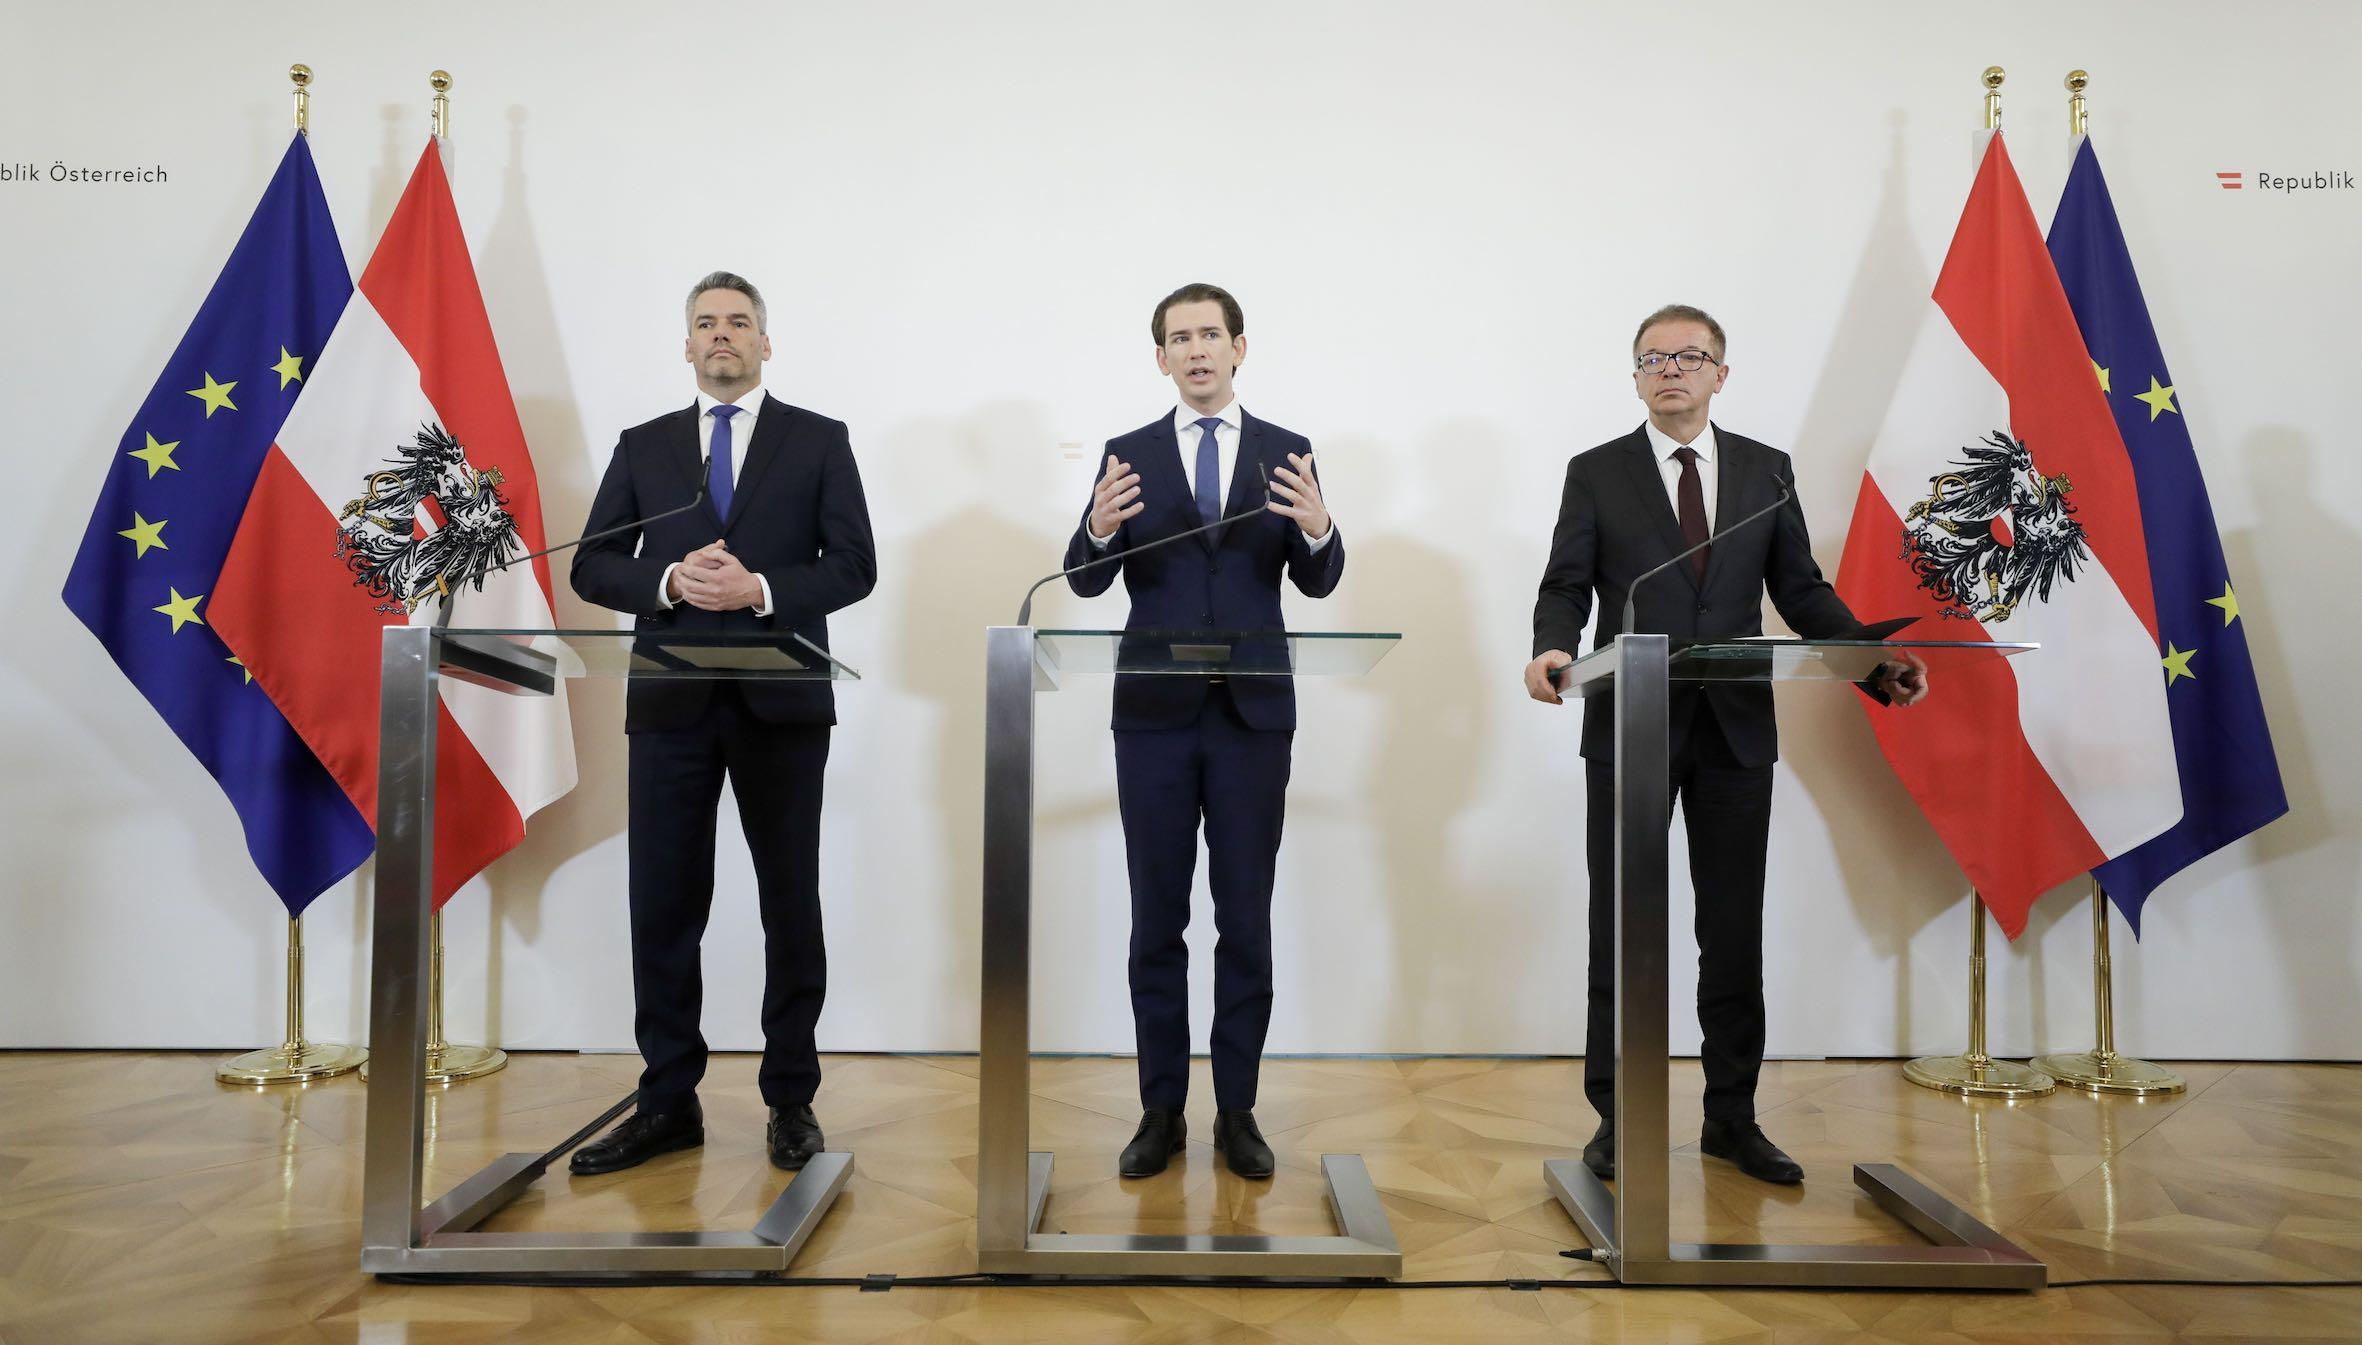 Bundeskanzler Sebastian Kurz (m.), Bundesminister Rudolf Anschober (r.) und Bundesminister Karl Nehammer (l.) beim Doorstep vor dem Ministerrat am 26. Februar 2020. FotografIn: Andy Wenzel